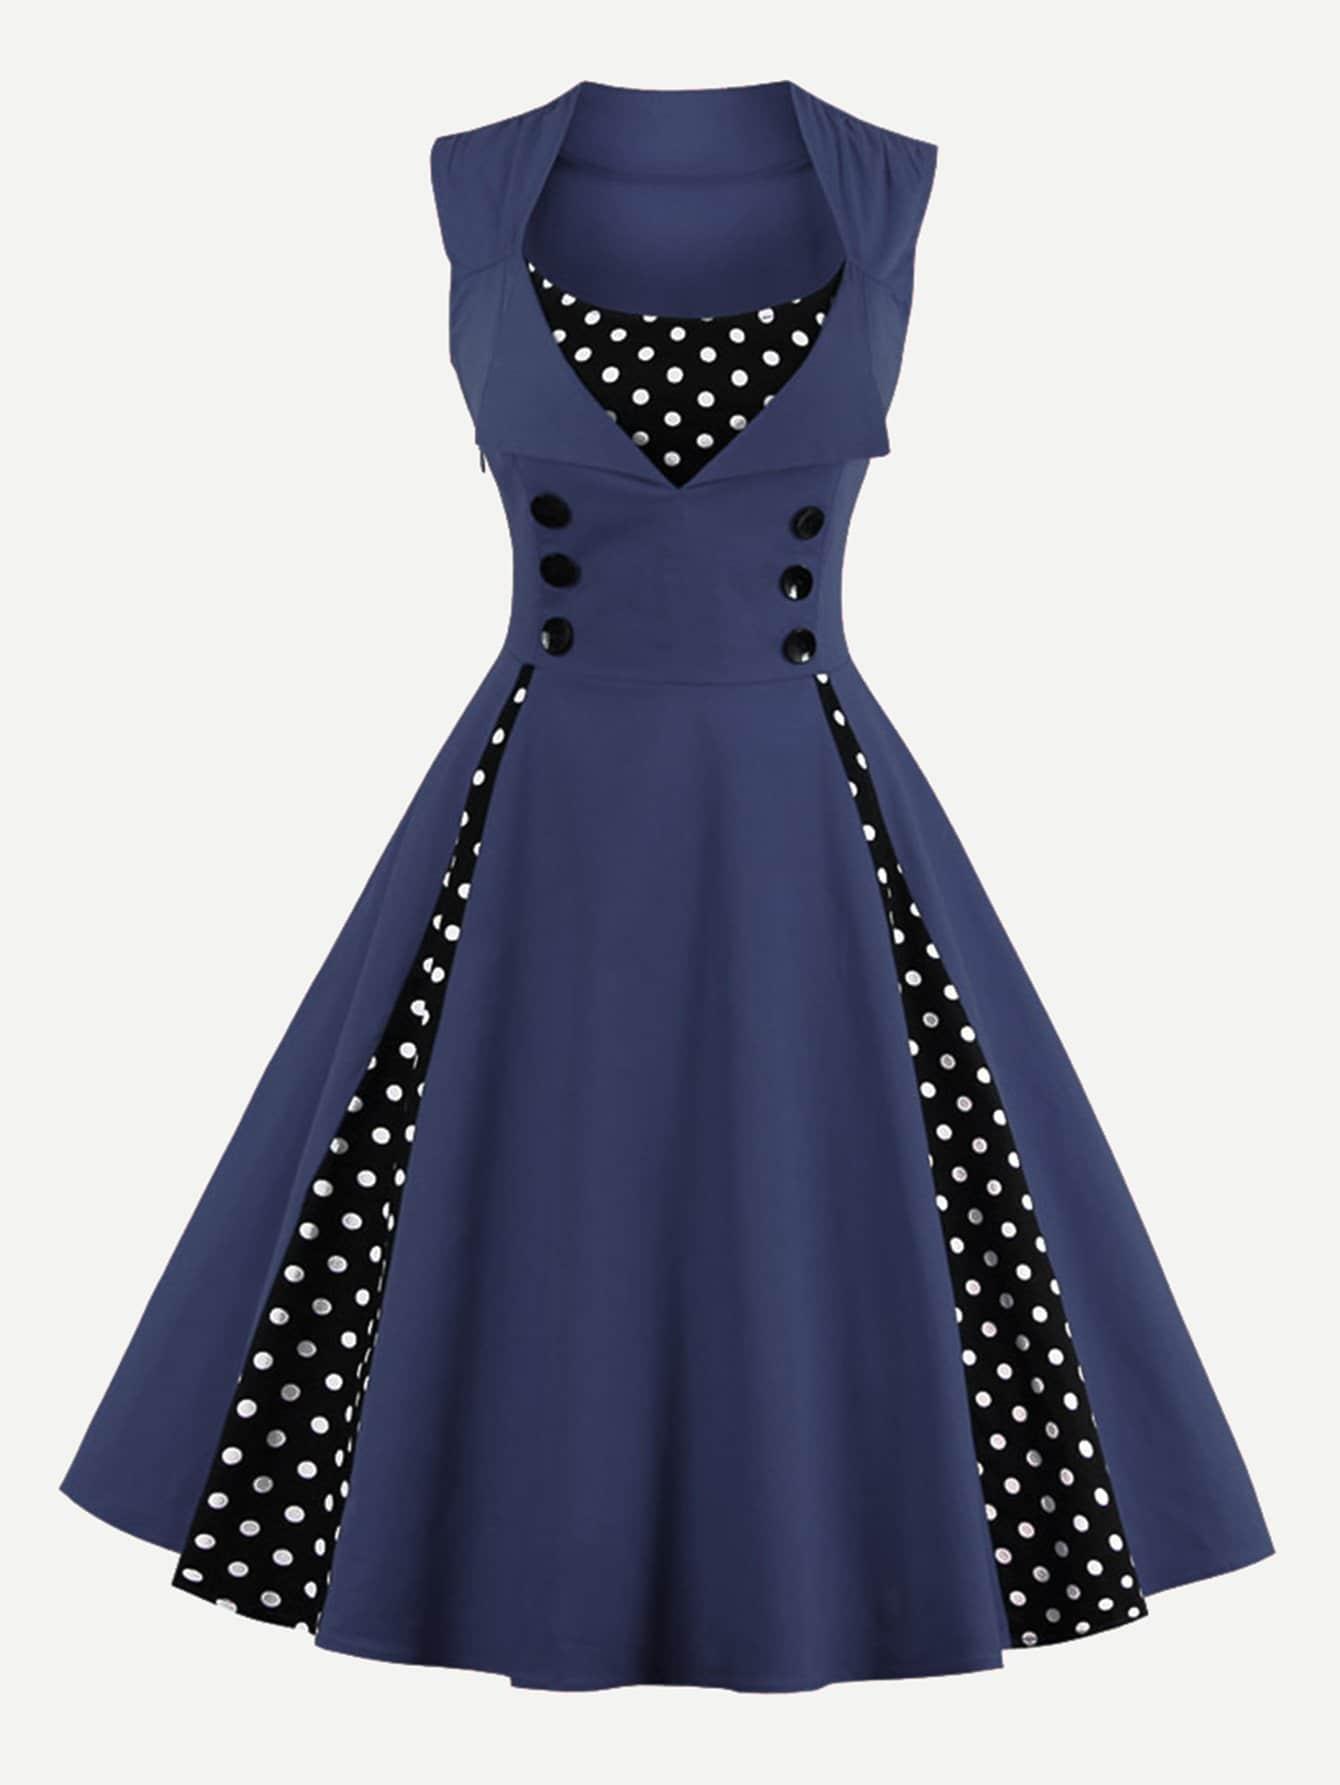 Contrast Polka Dot Foldover Circle Dress contrast collar foldover front dress